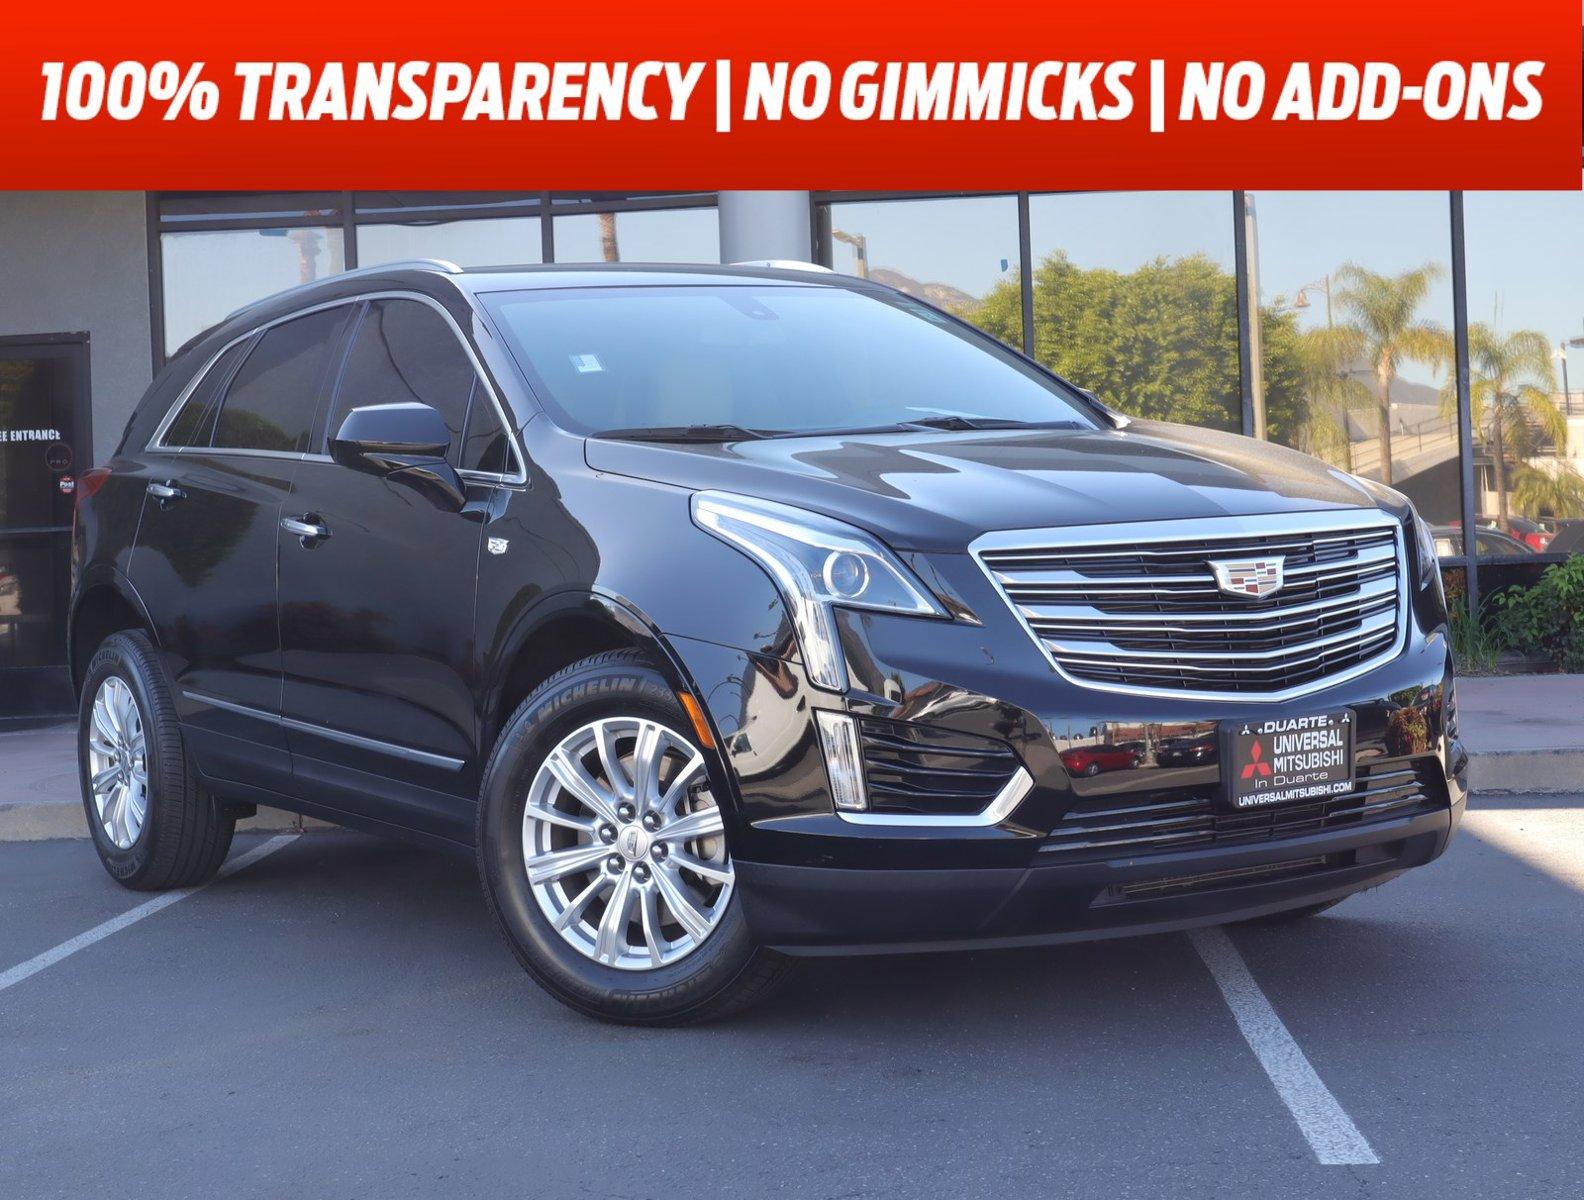 2019 Cadillac XT5 FWD FWD 4dr Gas V6 3.6L/222 [10]